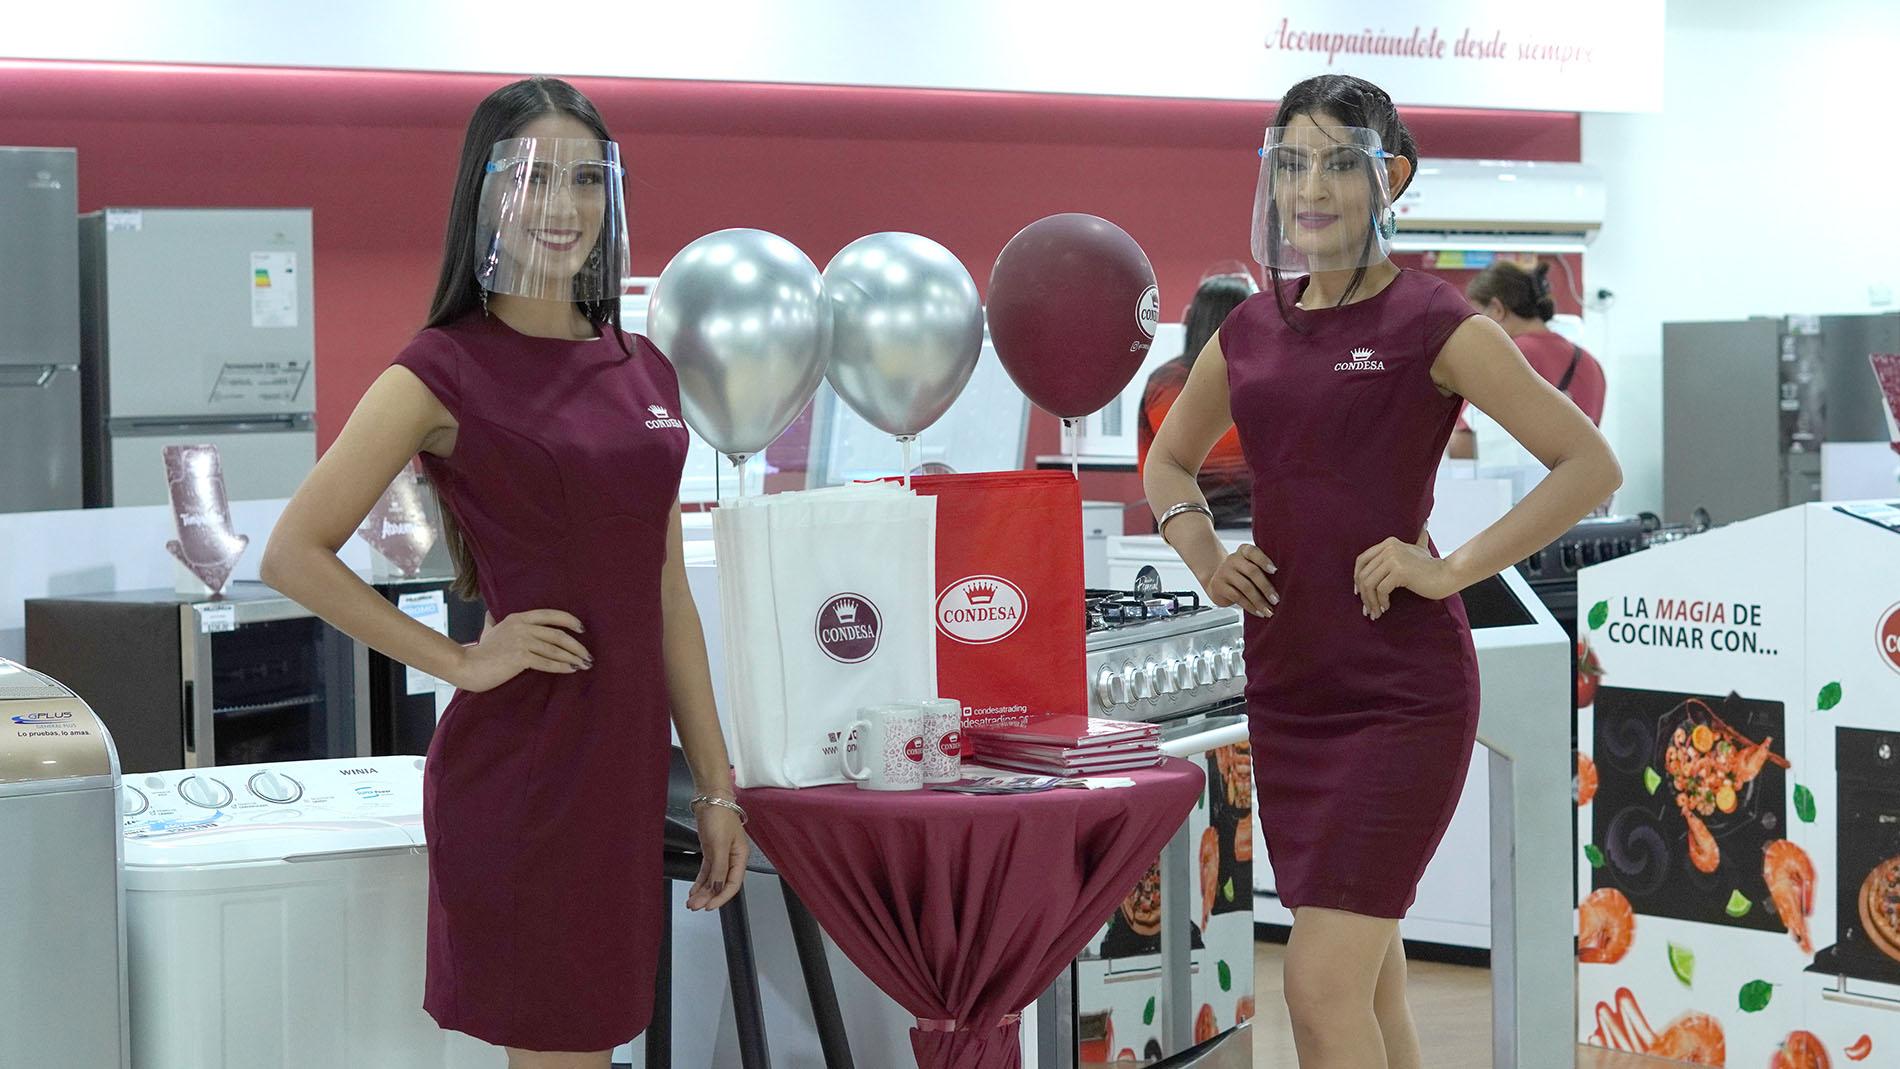 Multimax Store Maracaibo - 1